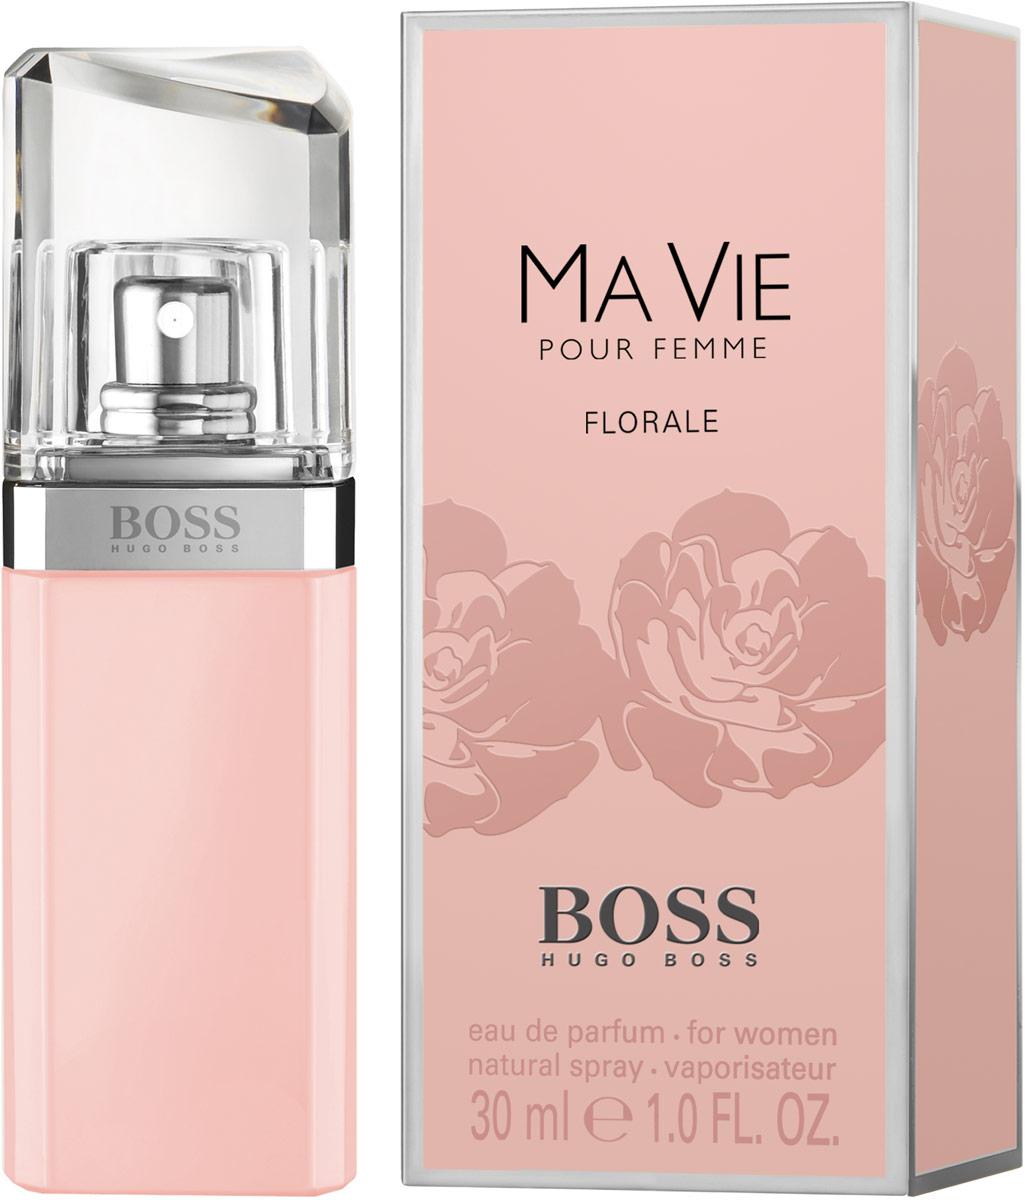 Фото - Hugo Boss Ma Vie Florale 30 мл парфюмерная вода hugo boss ma vie florale 50 мл женская